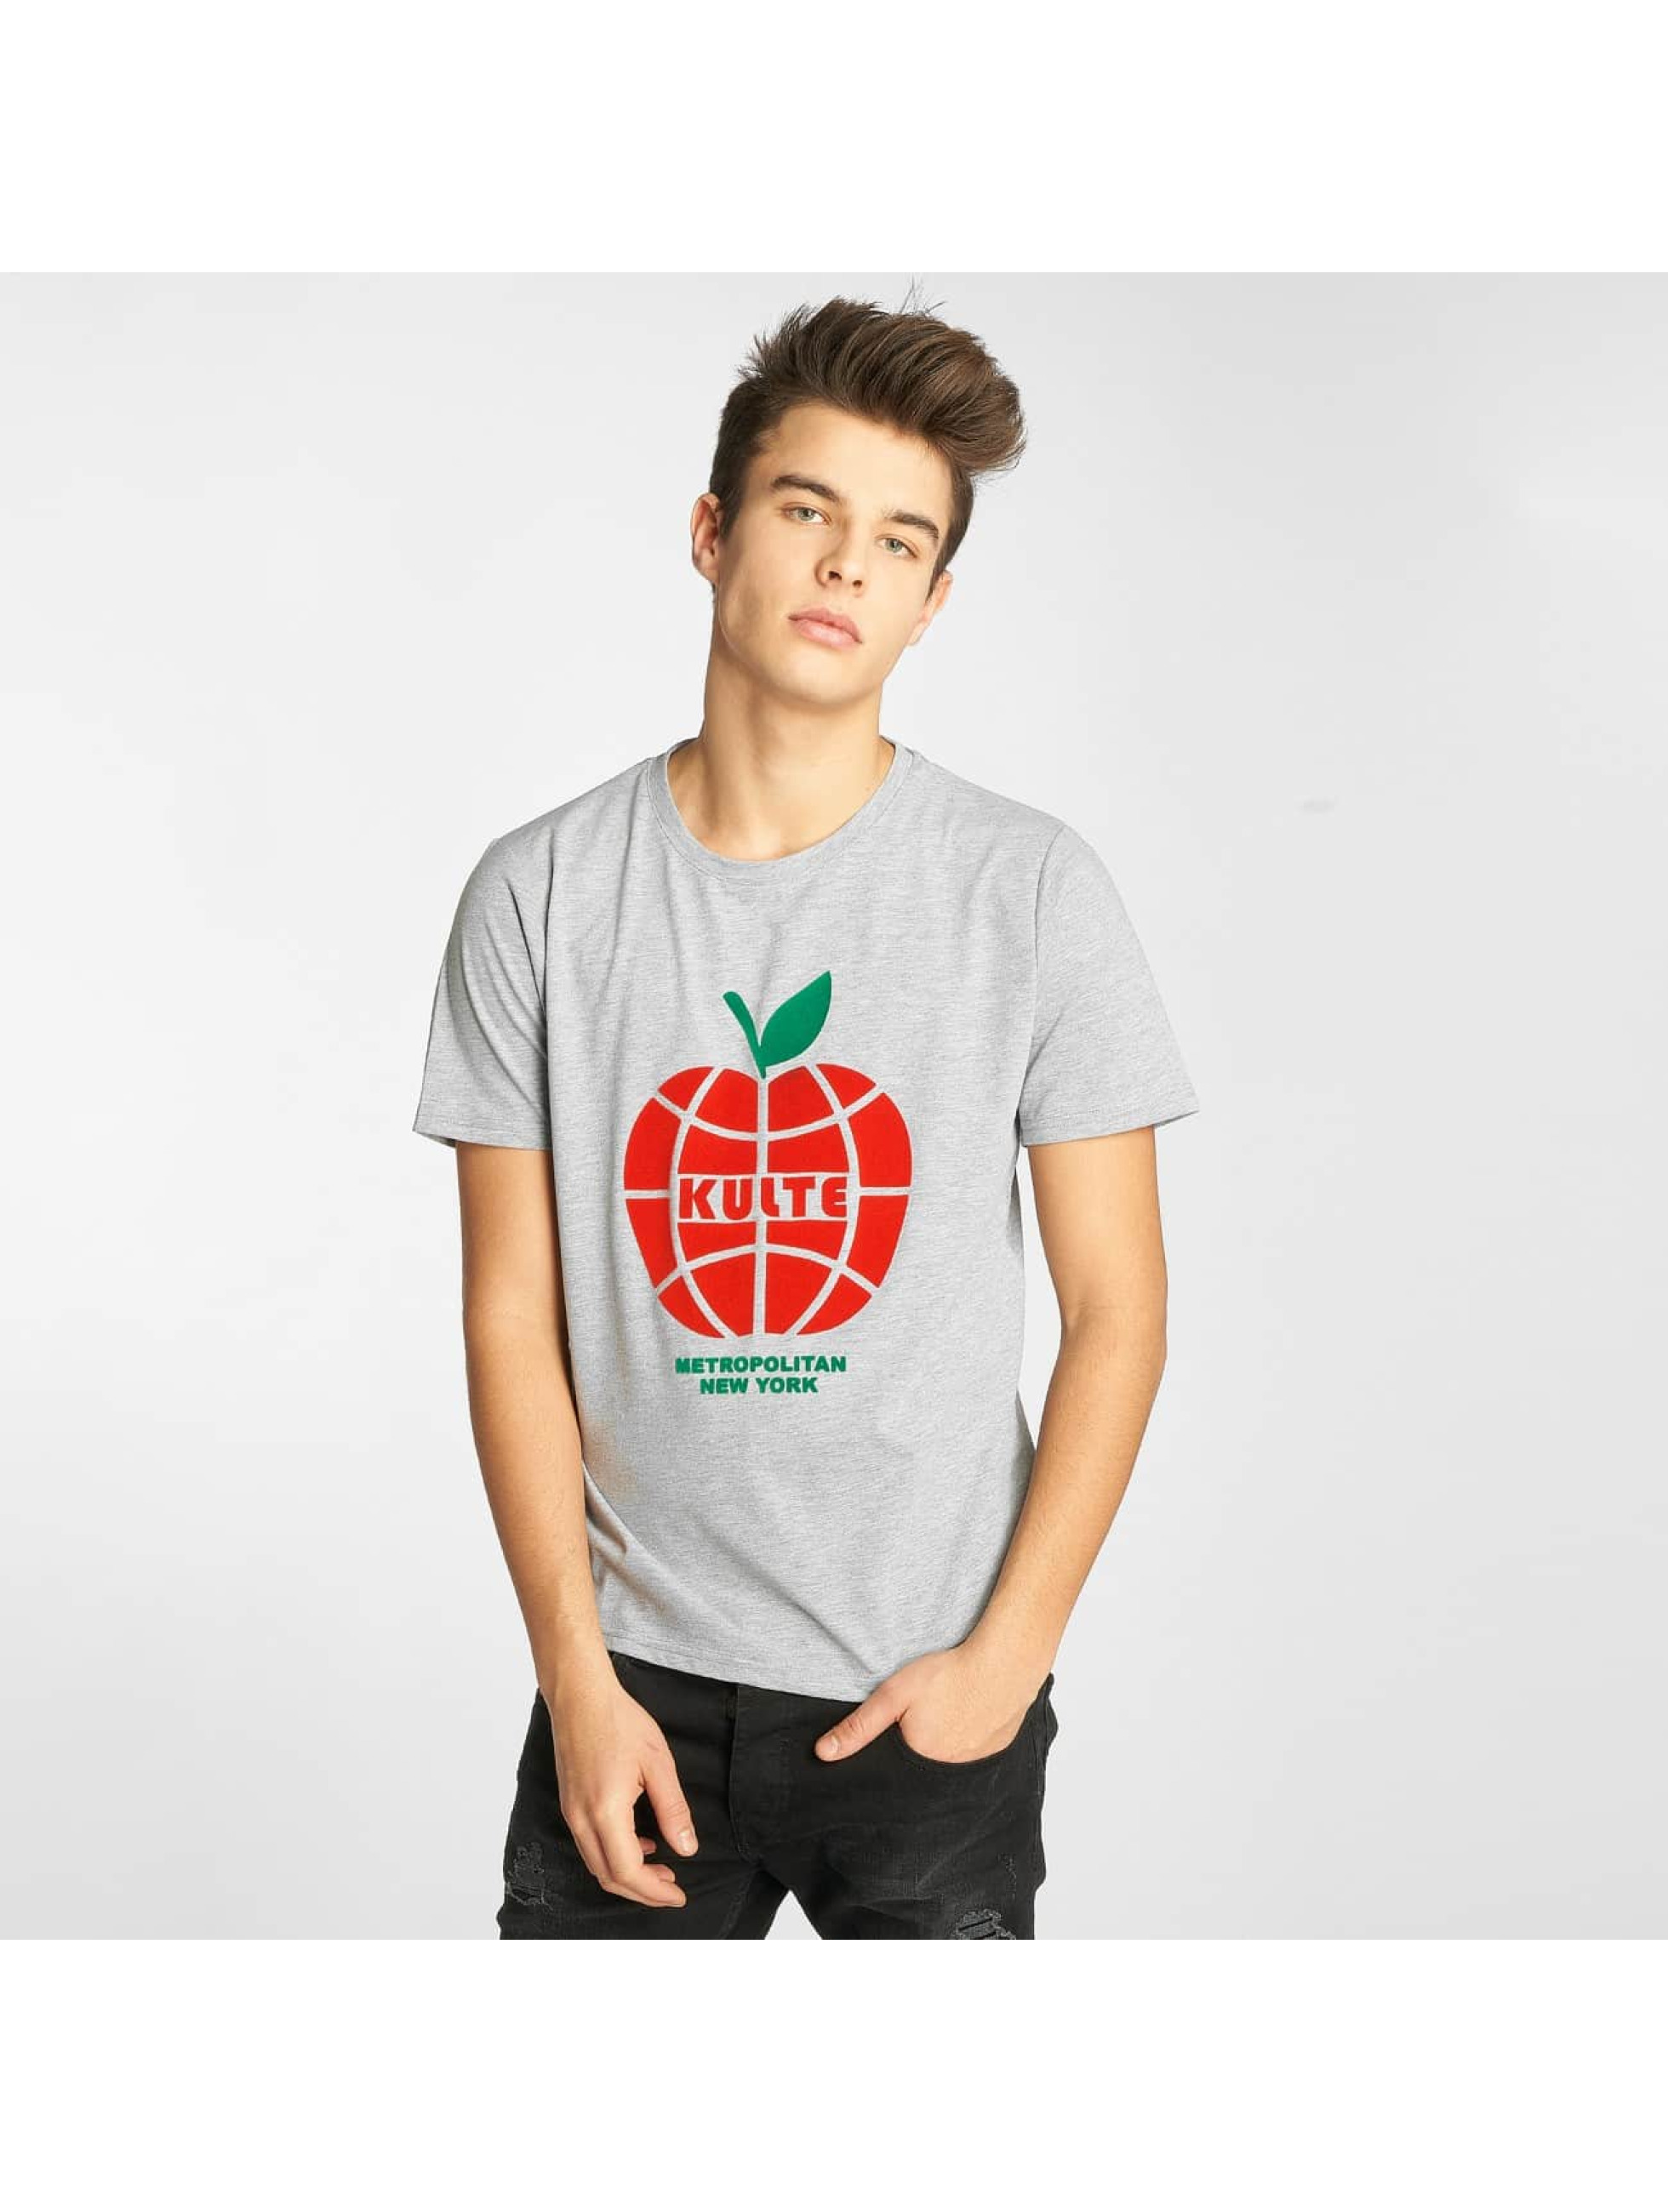 Kulte T-Shirt New York grau